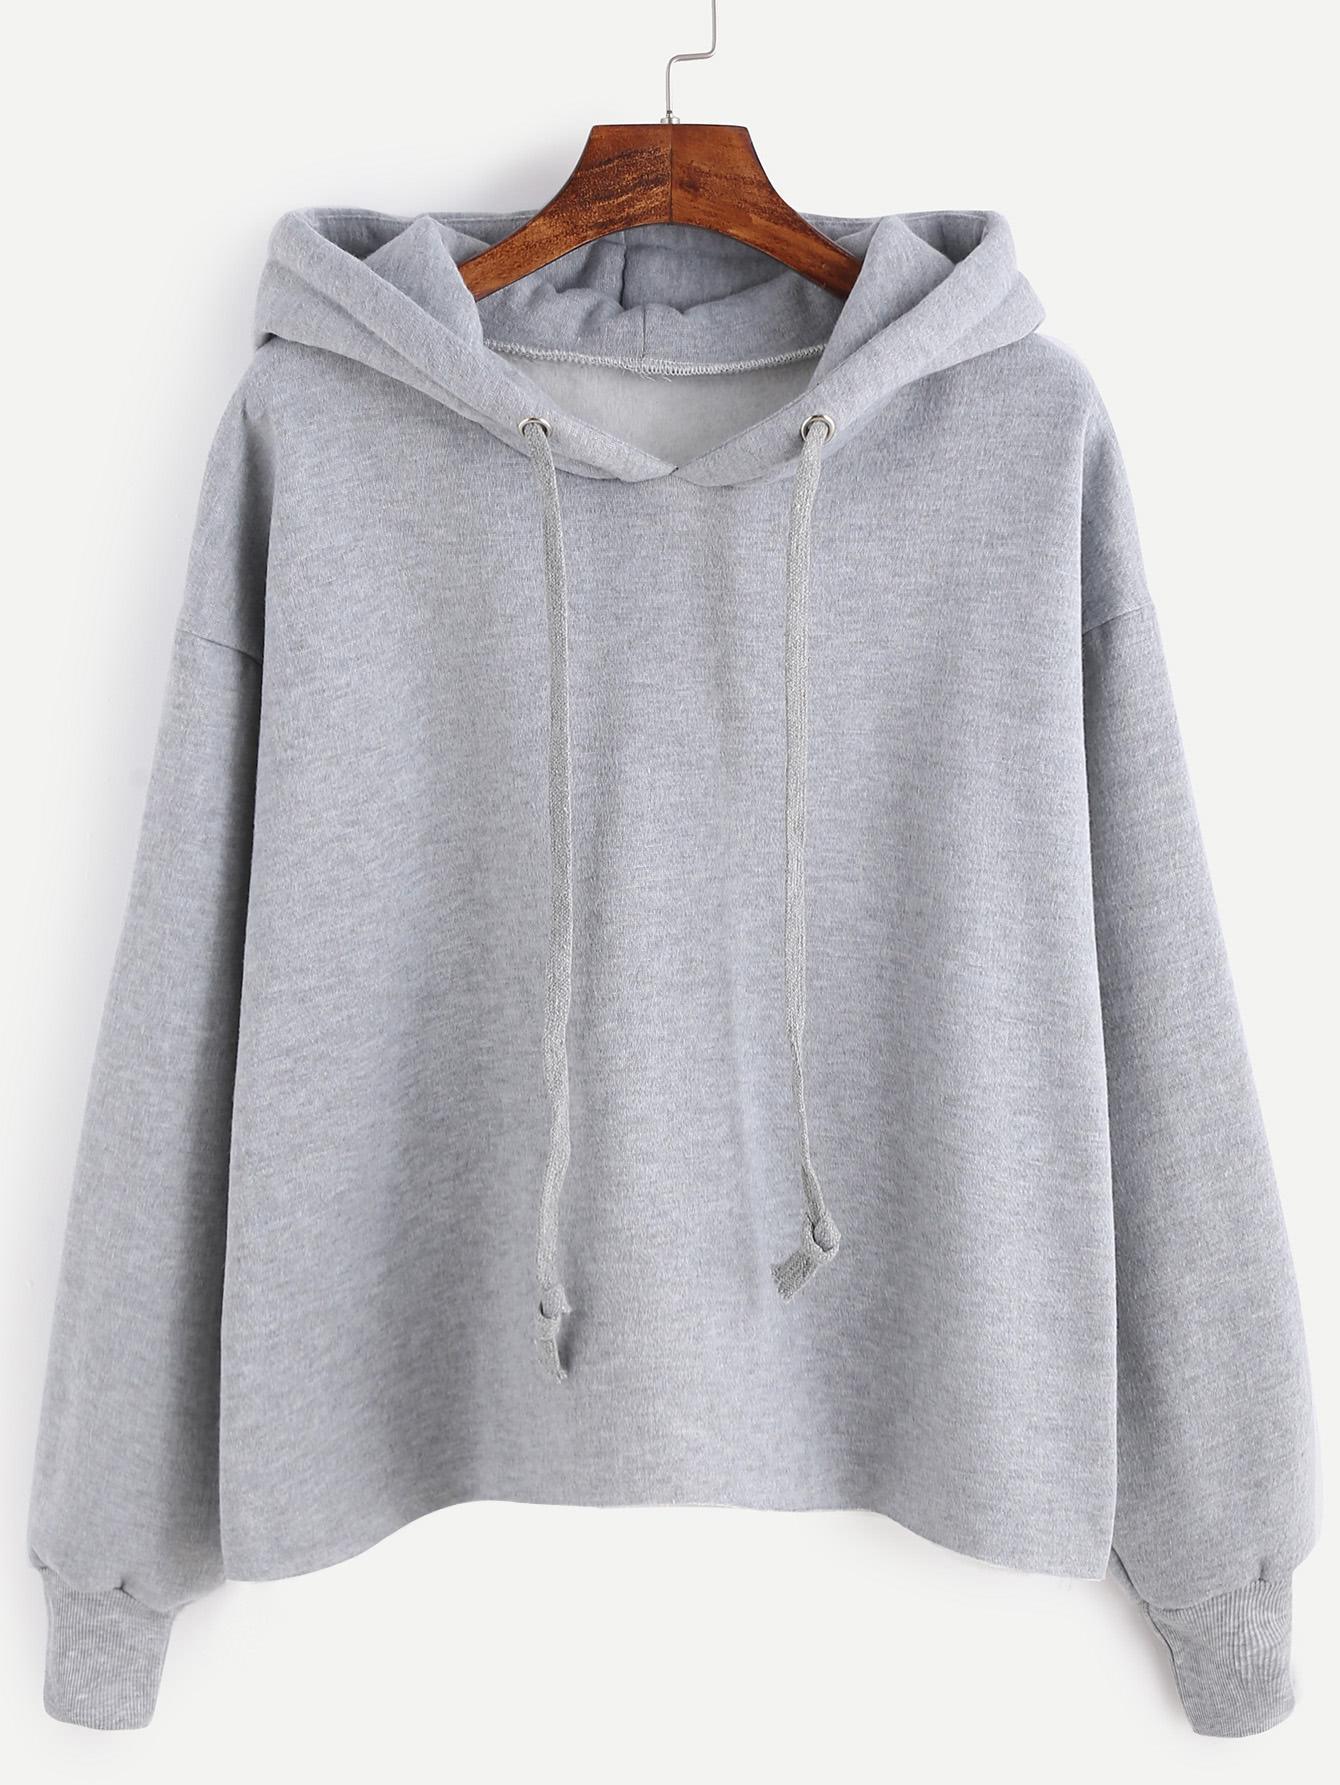 Grey Drawstring Hooded Sweatshirt